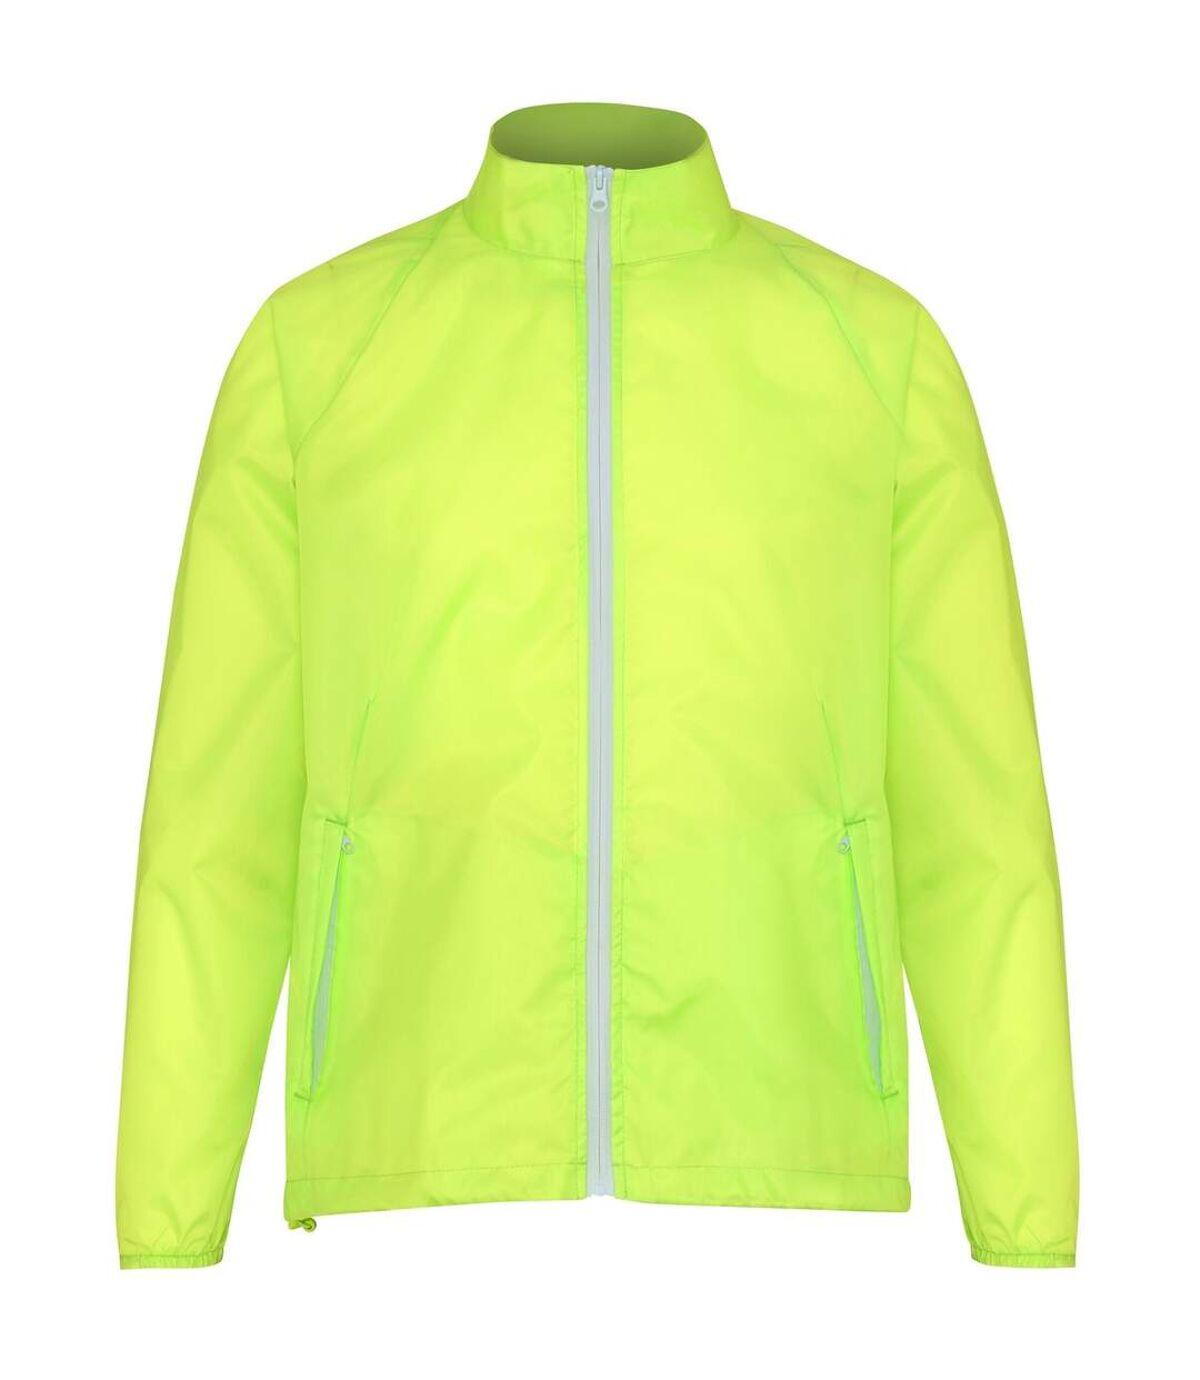 2786 Mens Contrast Lightweight Windcheater Shower Proof Jacket (Charcoal/ Black) - UTRW2501